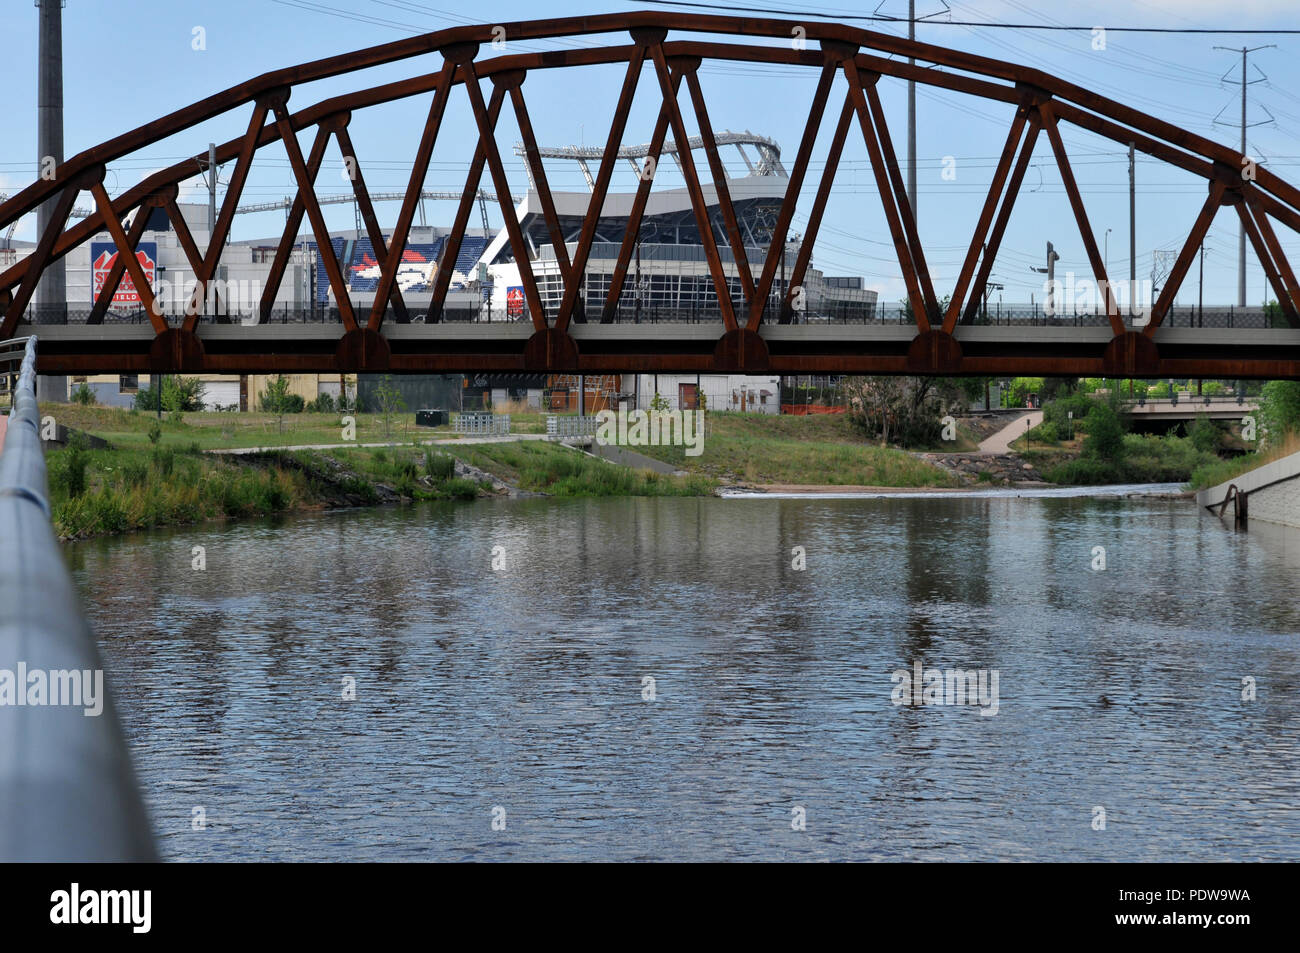 Invesco Field seen through a bridge crossing the South Platte River.  Exclusive Denver stock photos. - Stock Image